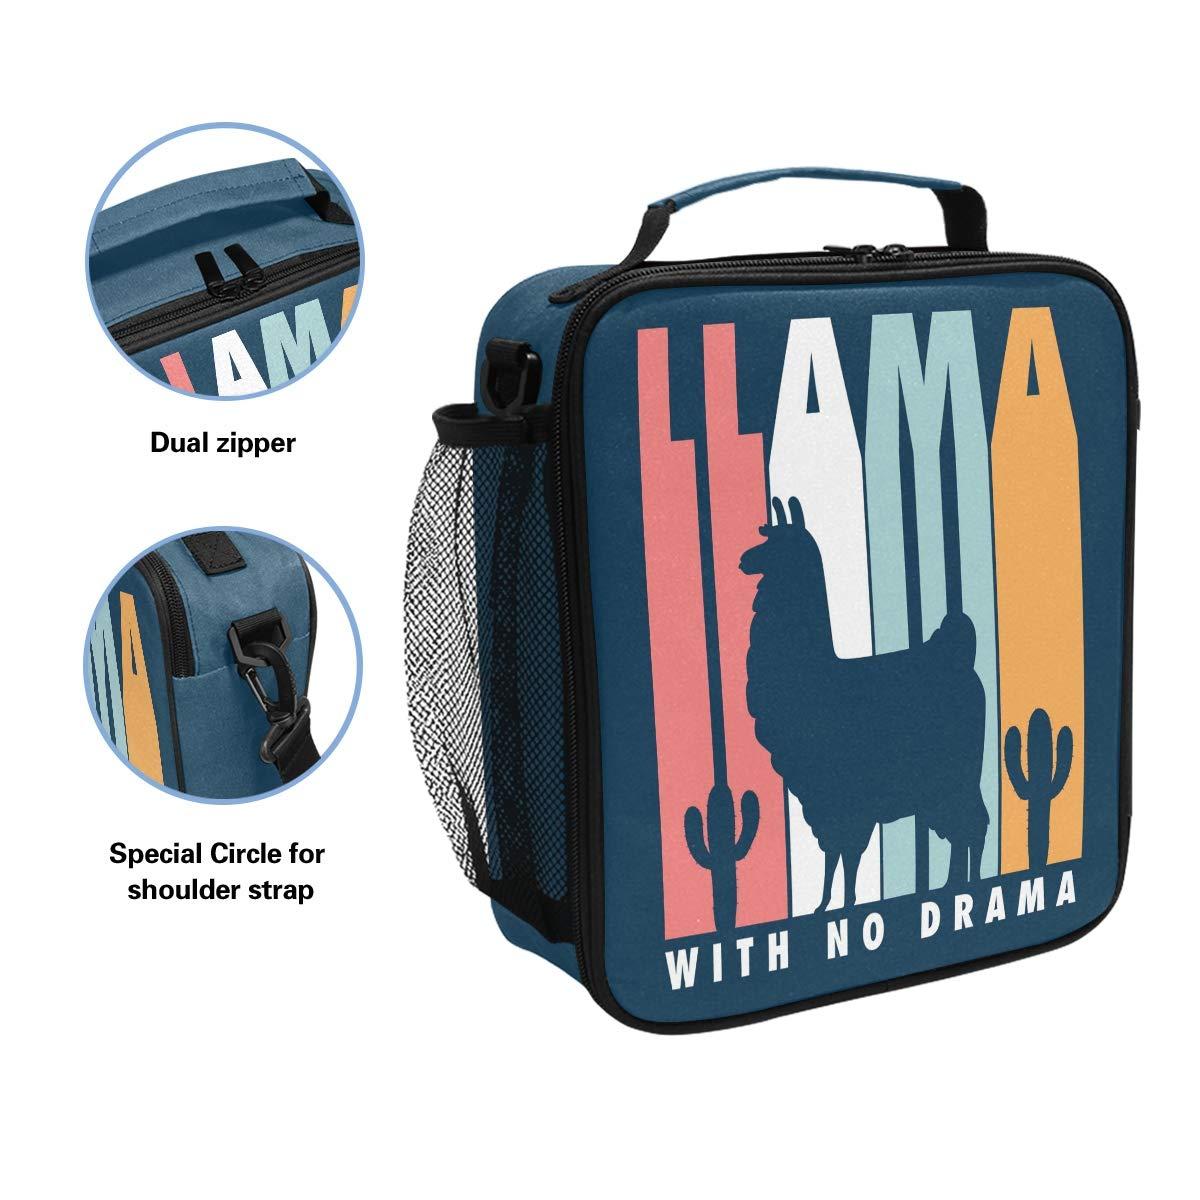 da308c44074b Amazon.com: Llama Silohuette With No Drama Insulated Lunch Bag Tote ...